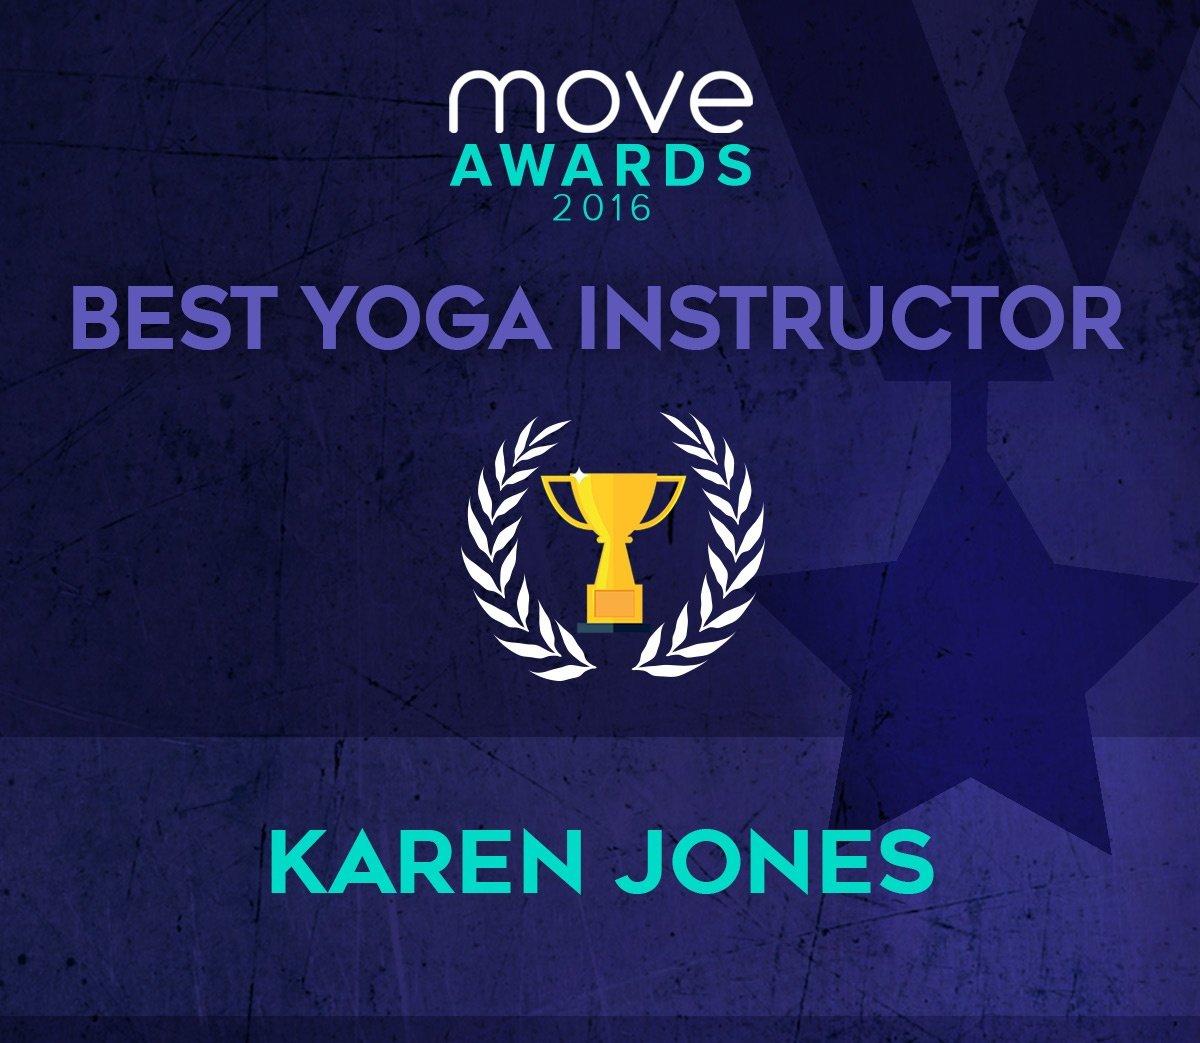 Best-Yoga-Instructor-Plymouth.jpg